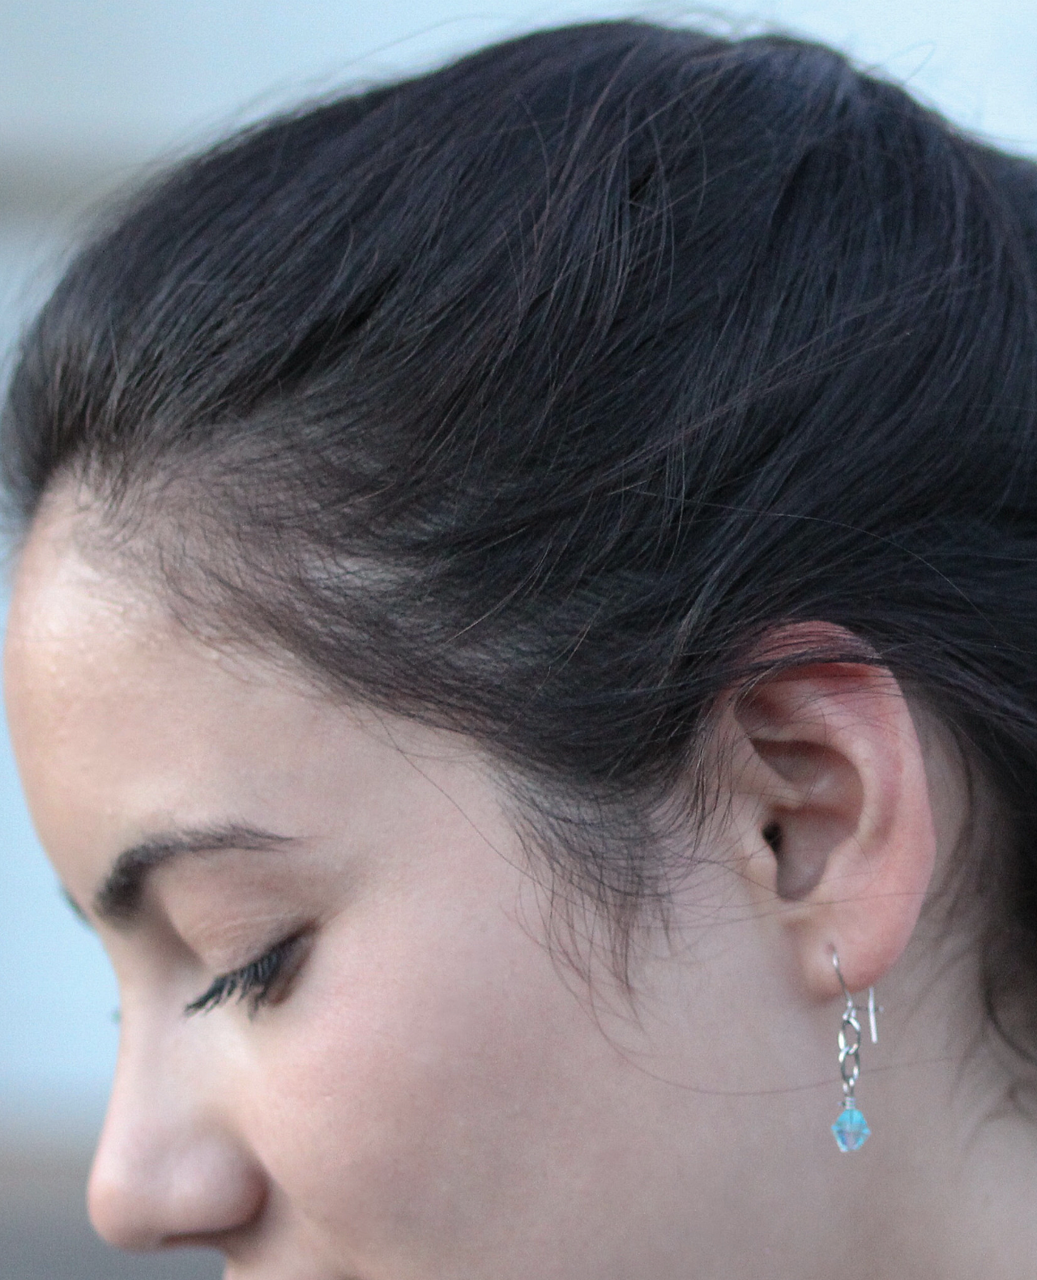 petite aqua crystal earring on female profile